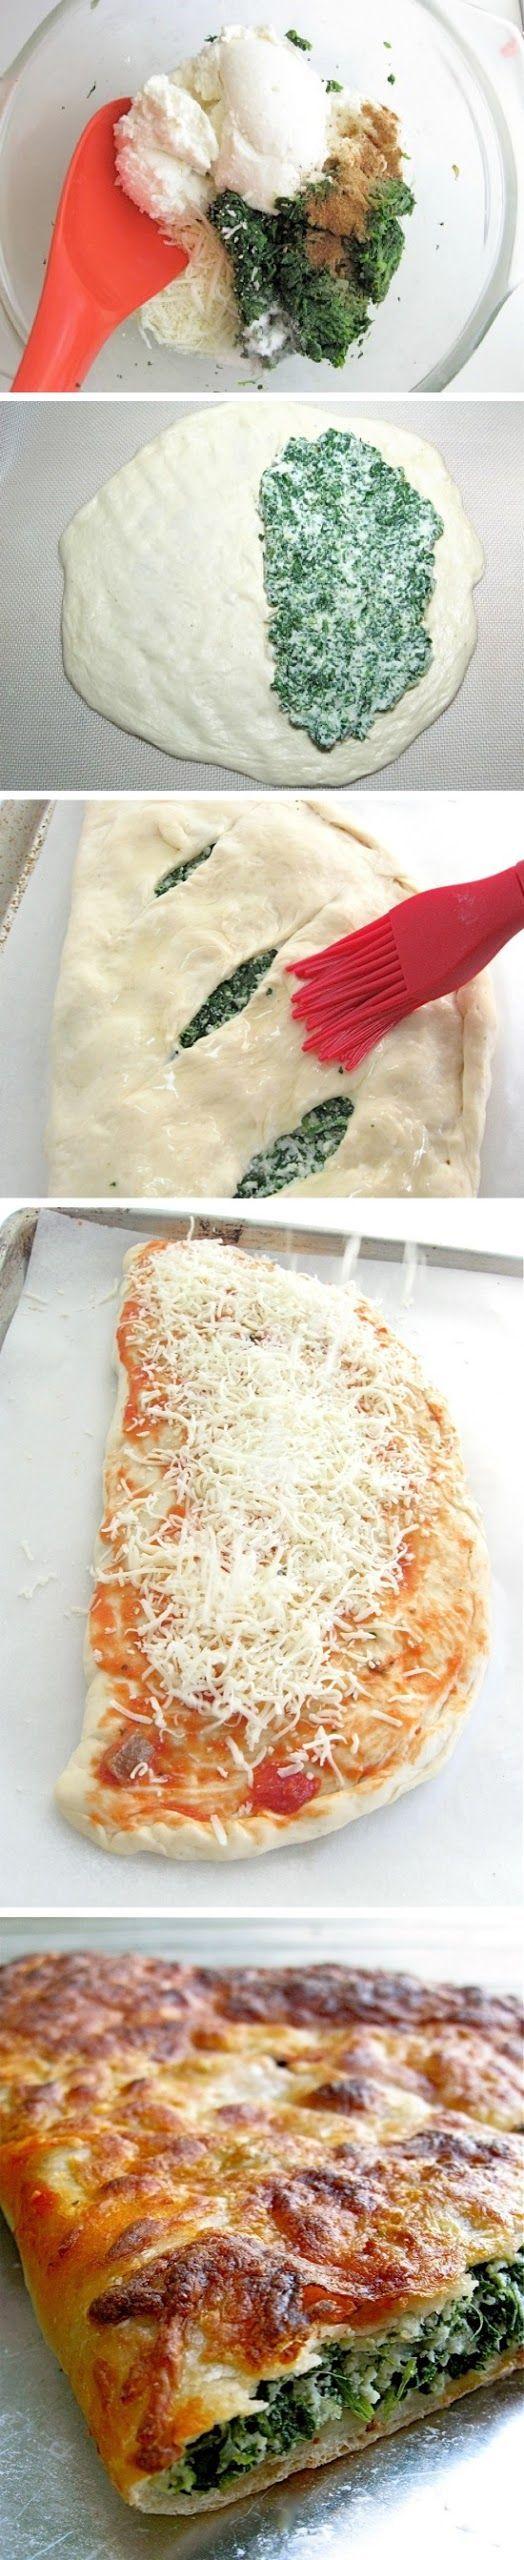 Calzones - Cheezy Spinach Version Recipe — Dishmaps